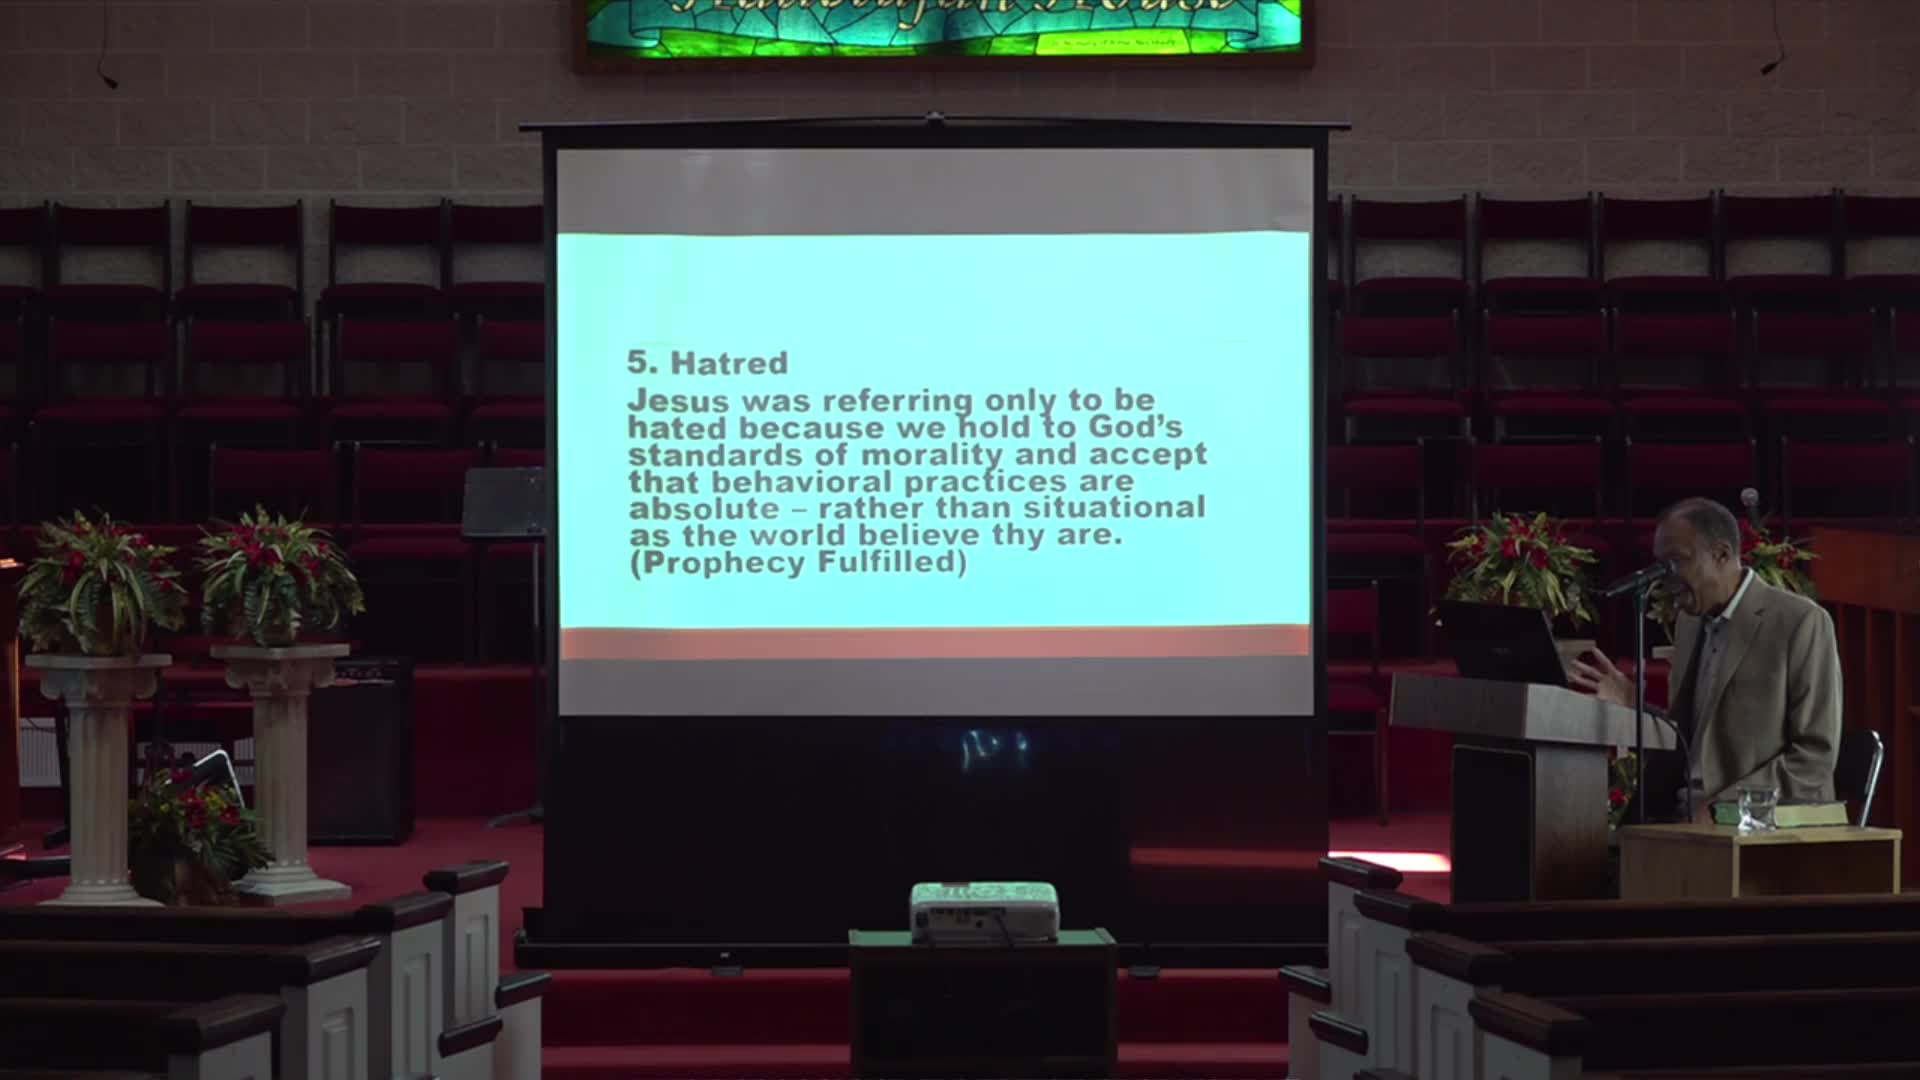 Columbia Community Church on 30-Jun-21-16:01:44